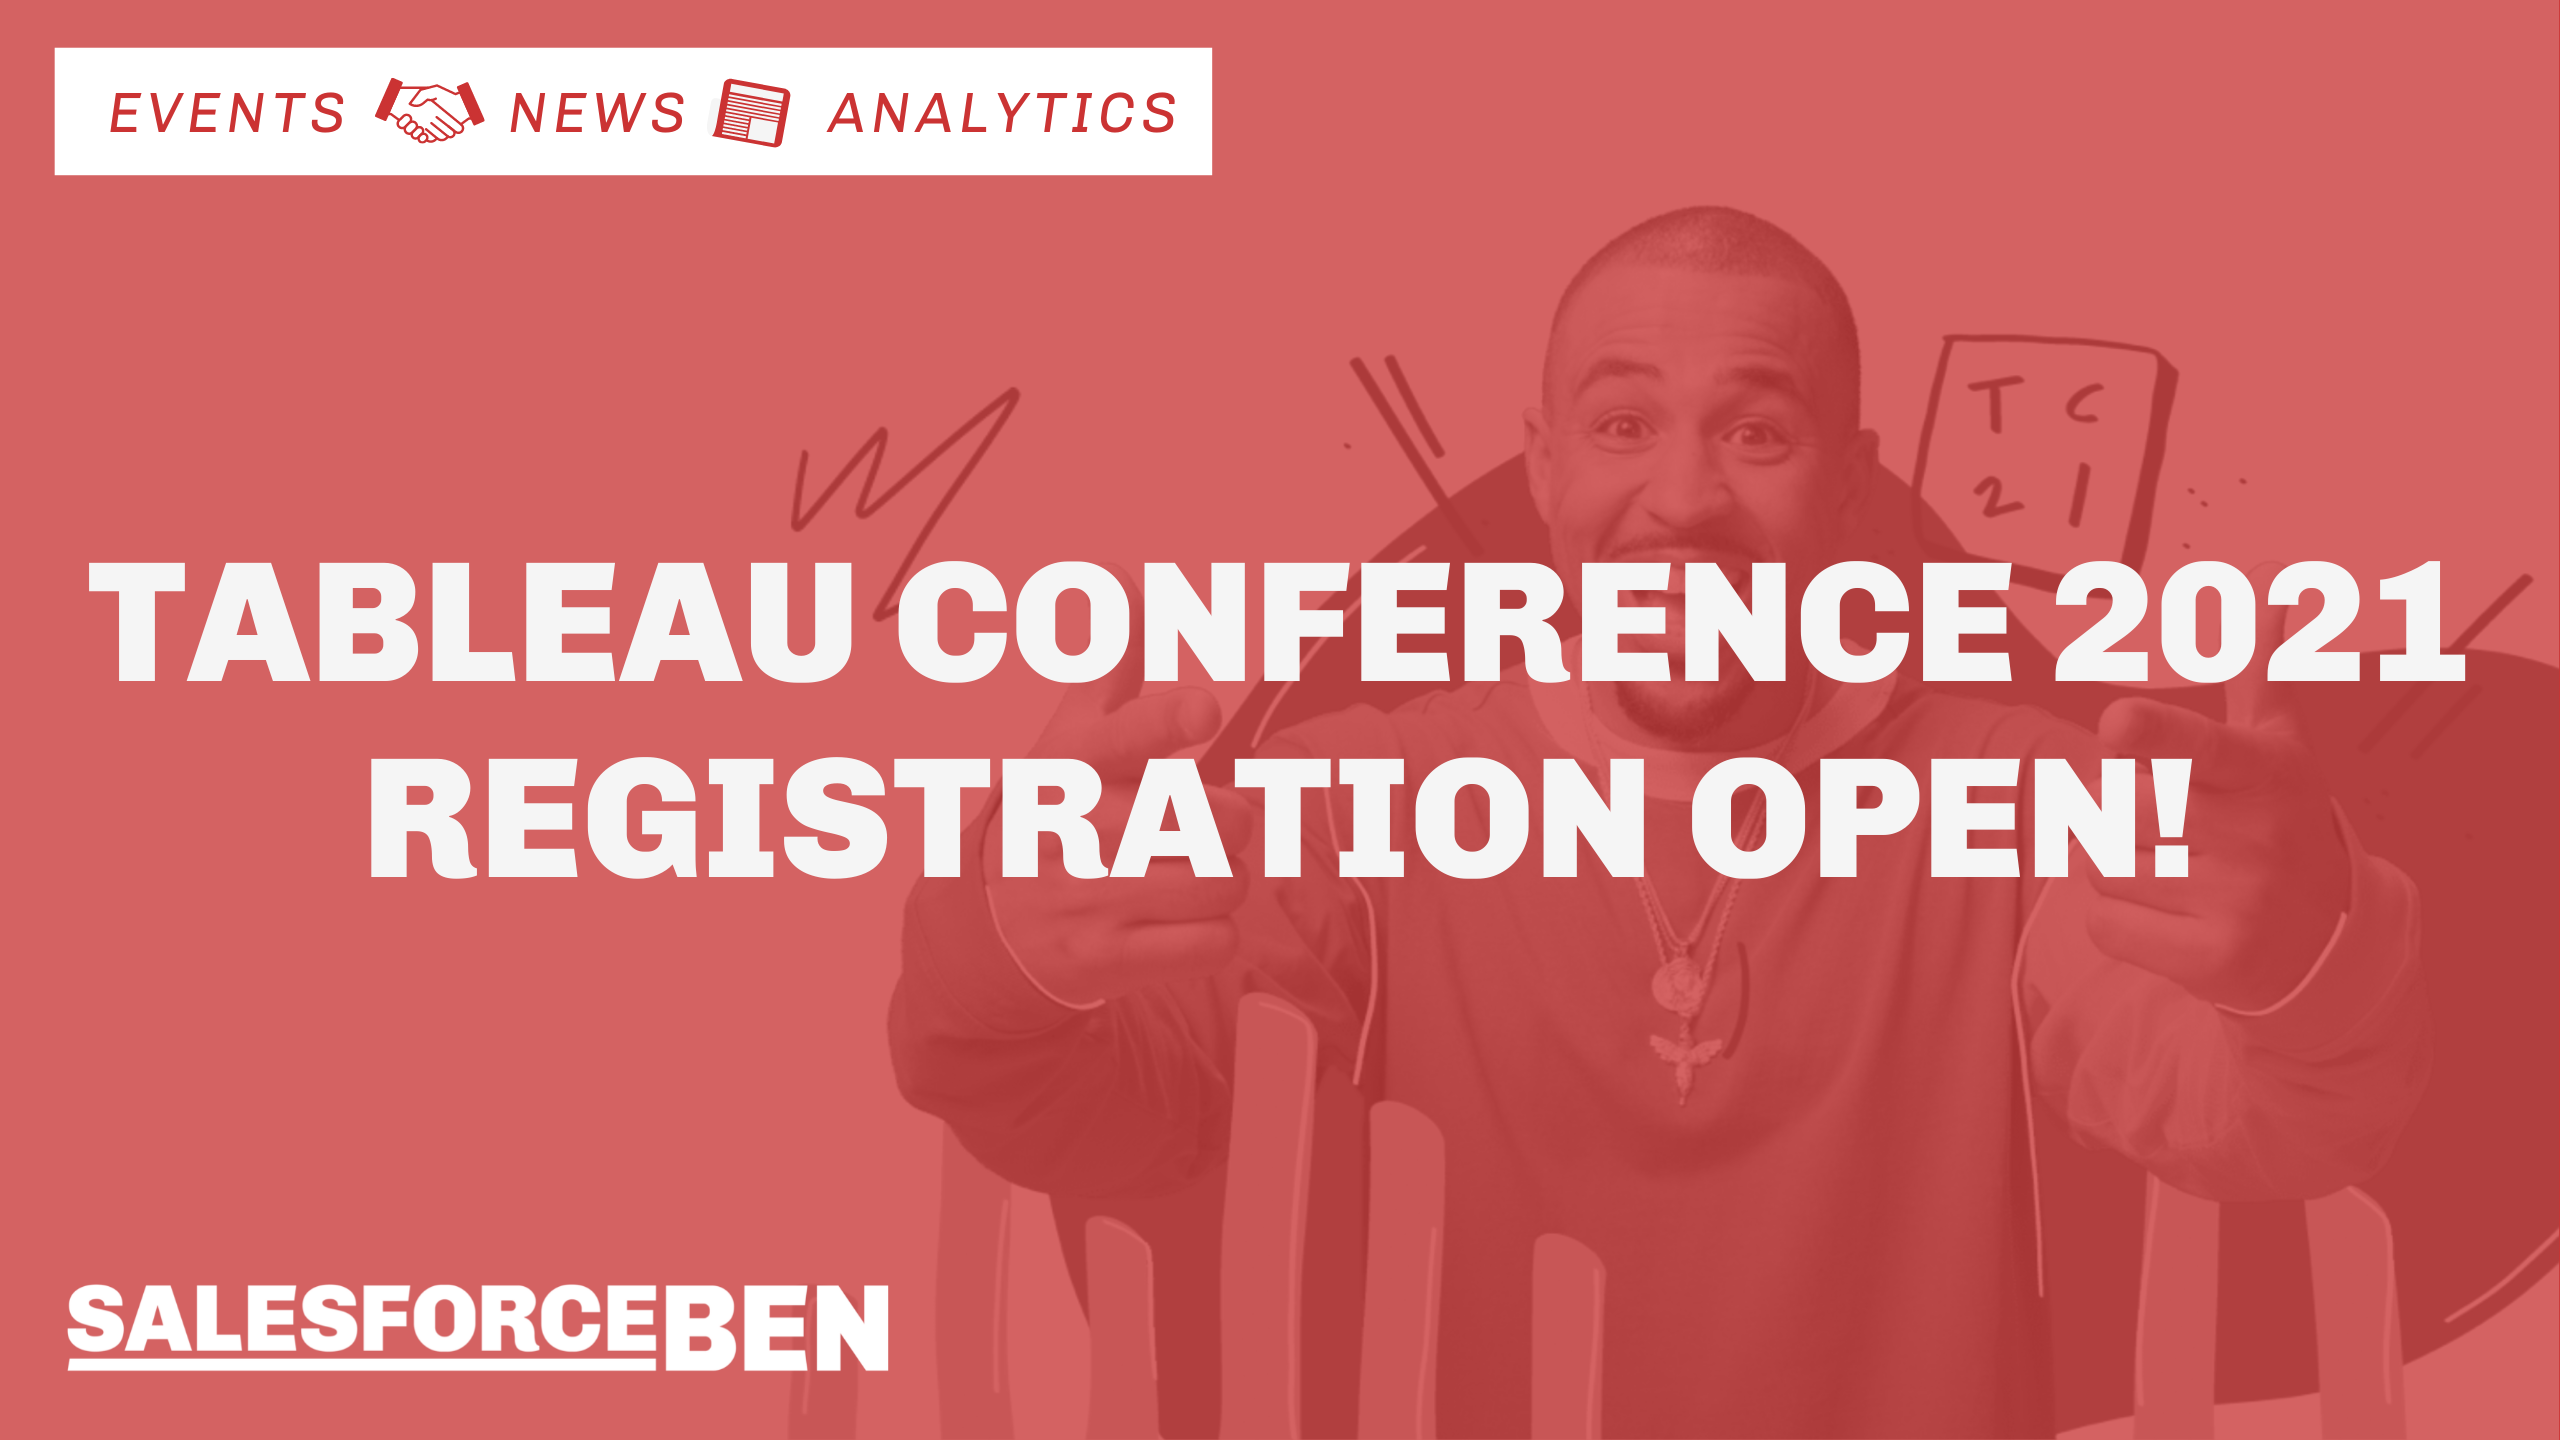 Tableau Conference 2021 – Registration Open!